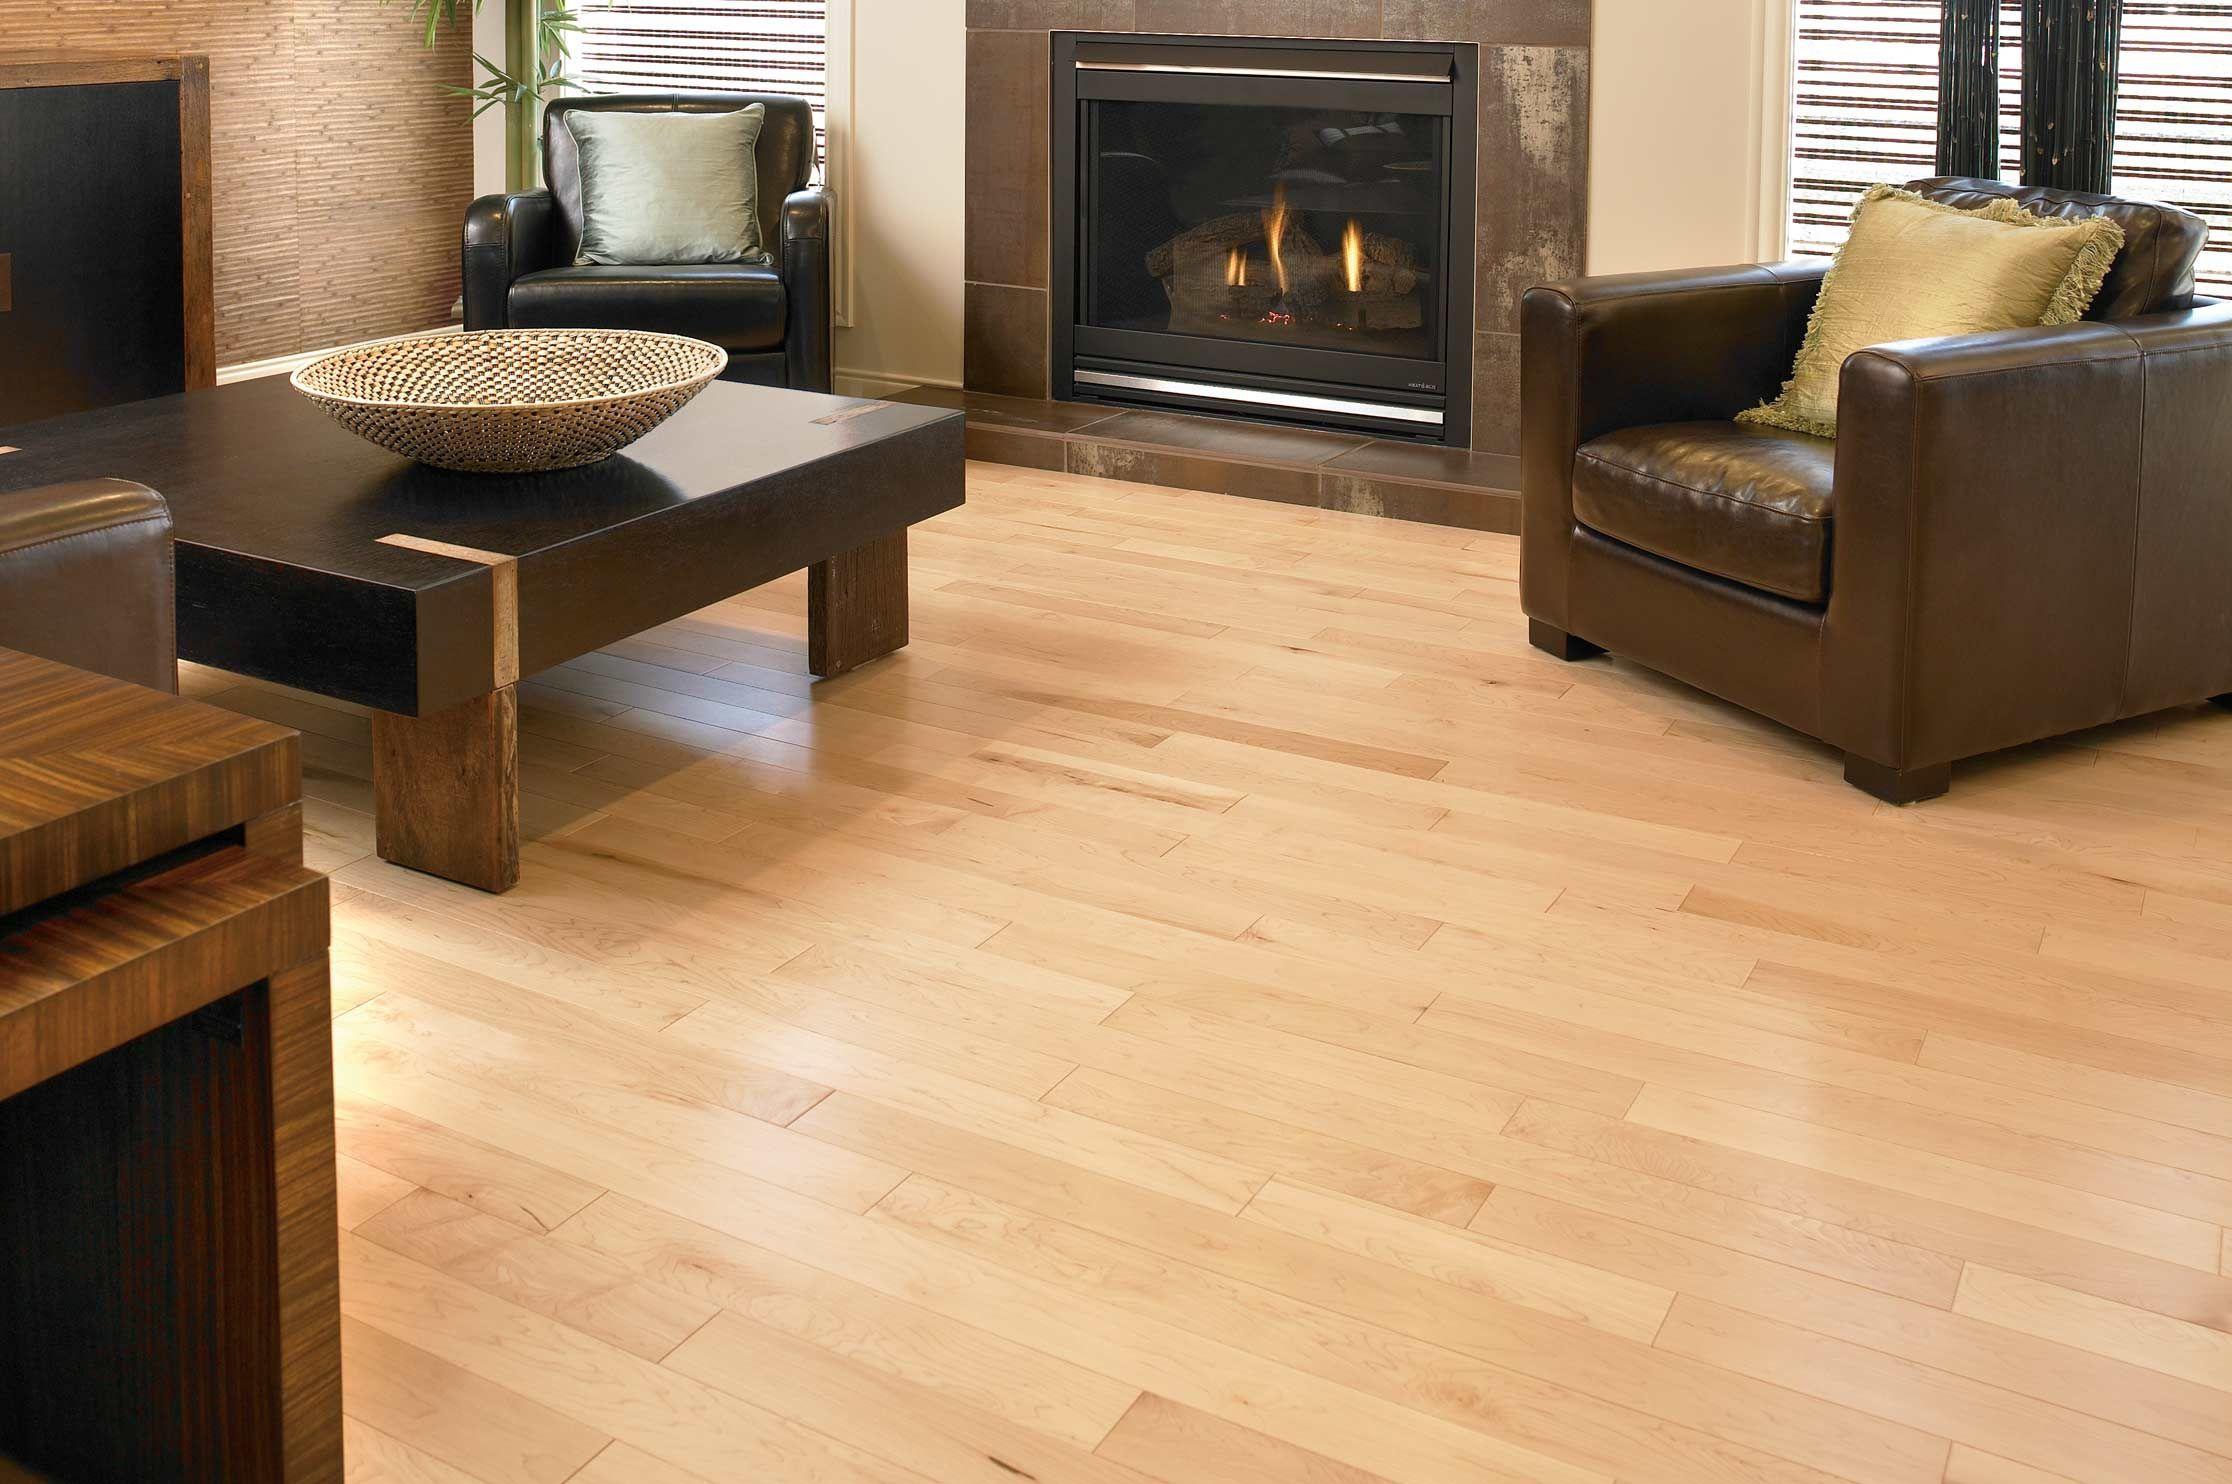 Warm Maple Flooring With Images Maple Hardwood Floors Maple Wood Flooring Maple Floors